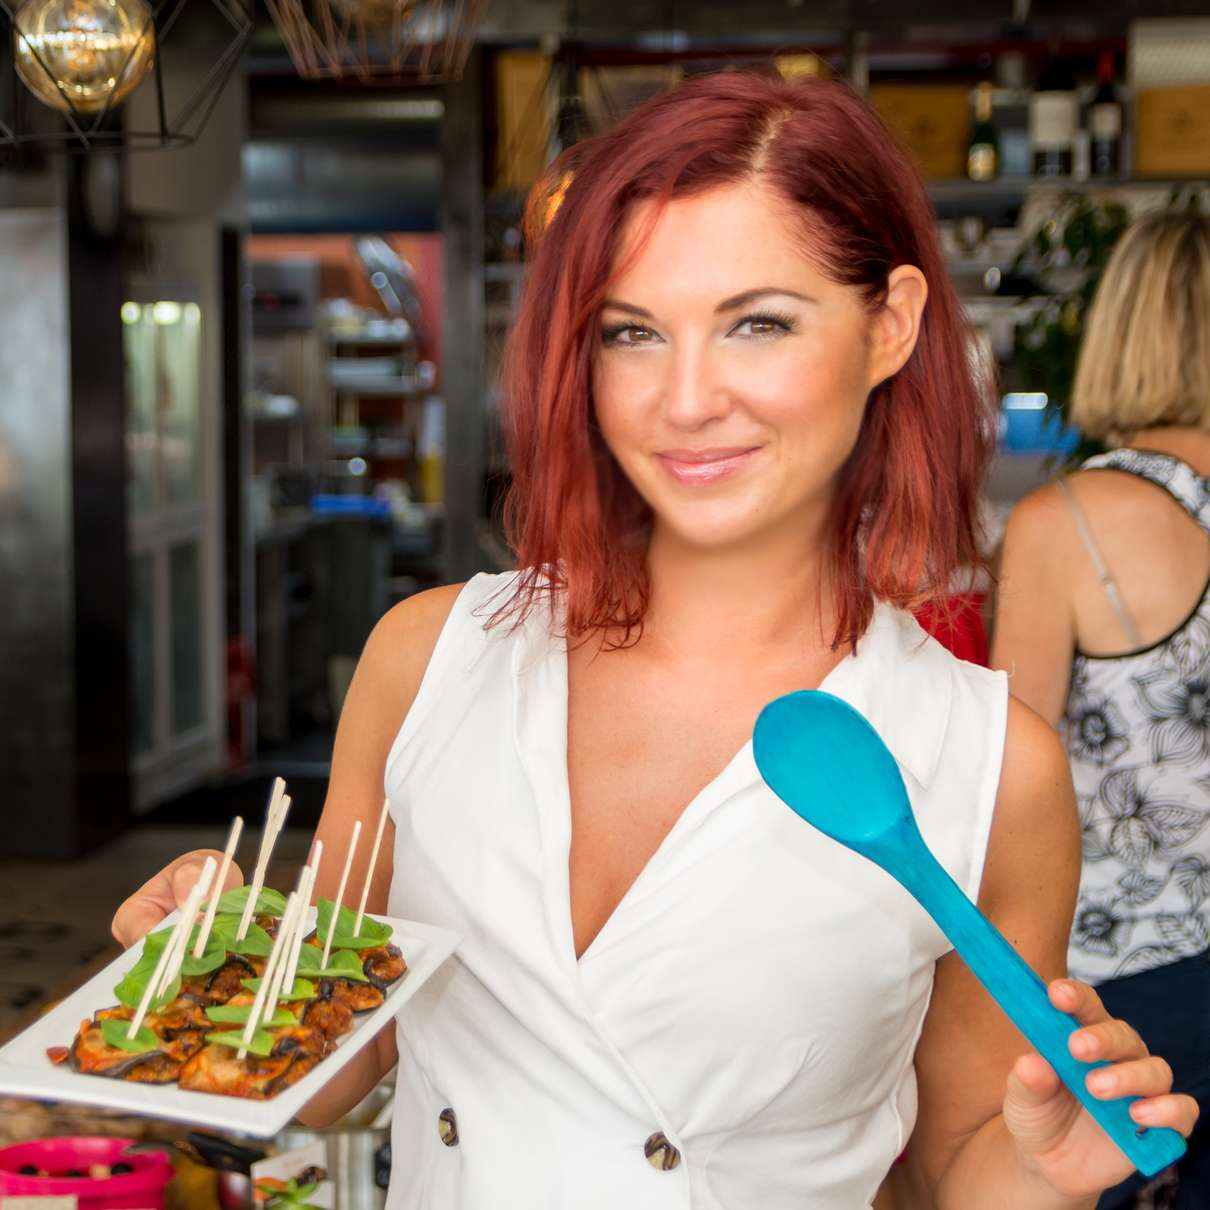 petra_kavsek_the_foodie_slovenia